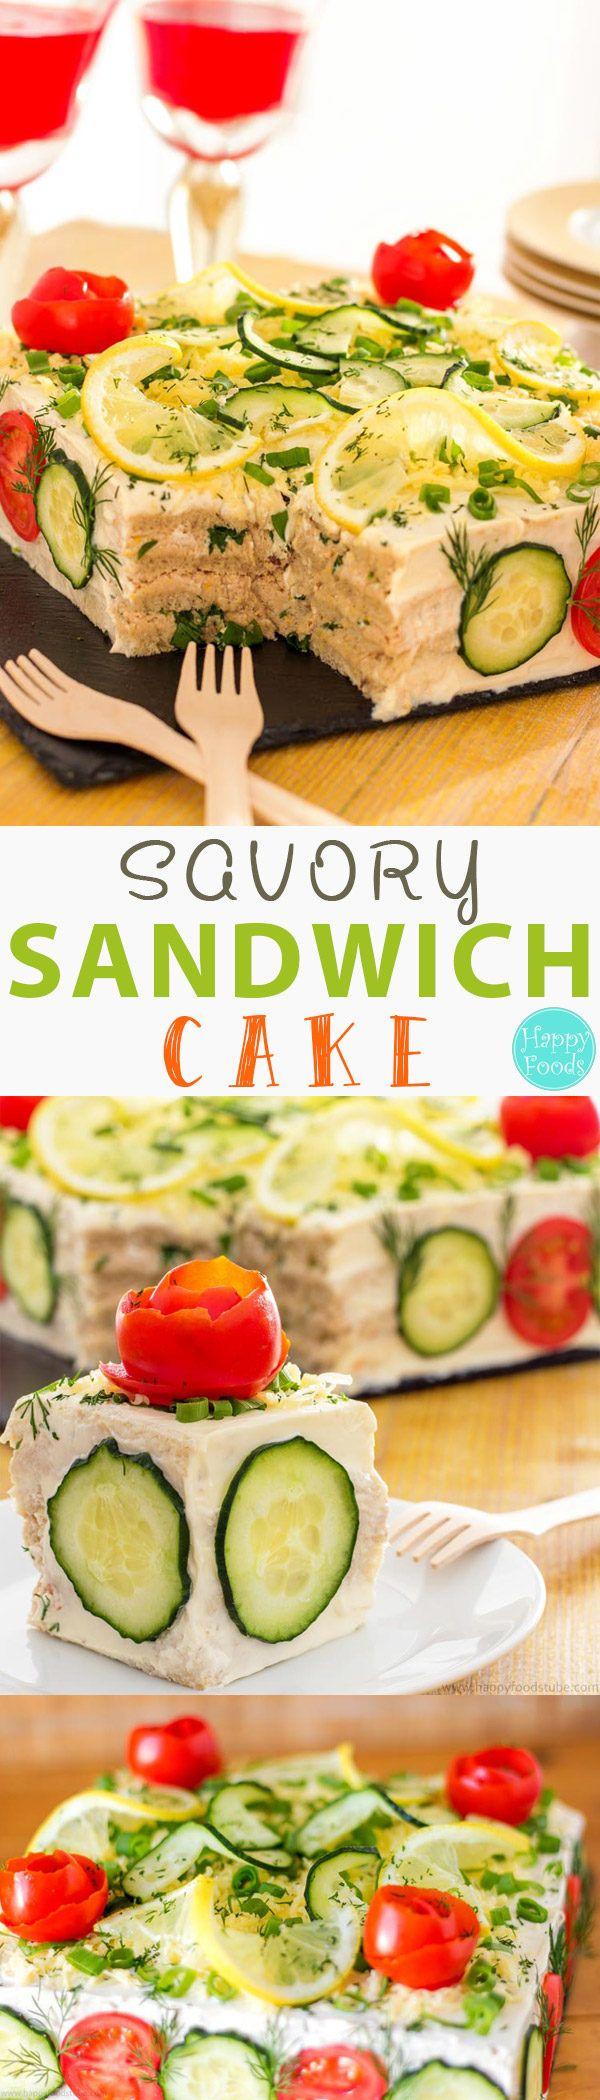 Savory Tuna Sandwich Cake (Smörgåstårta) - Swedish Sandwich Cake, Scandinavian…